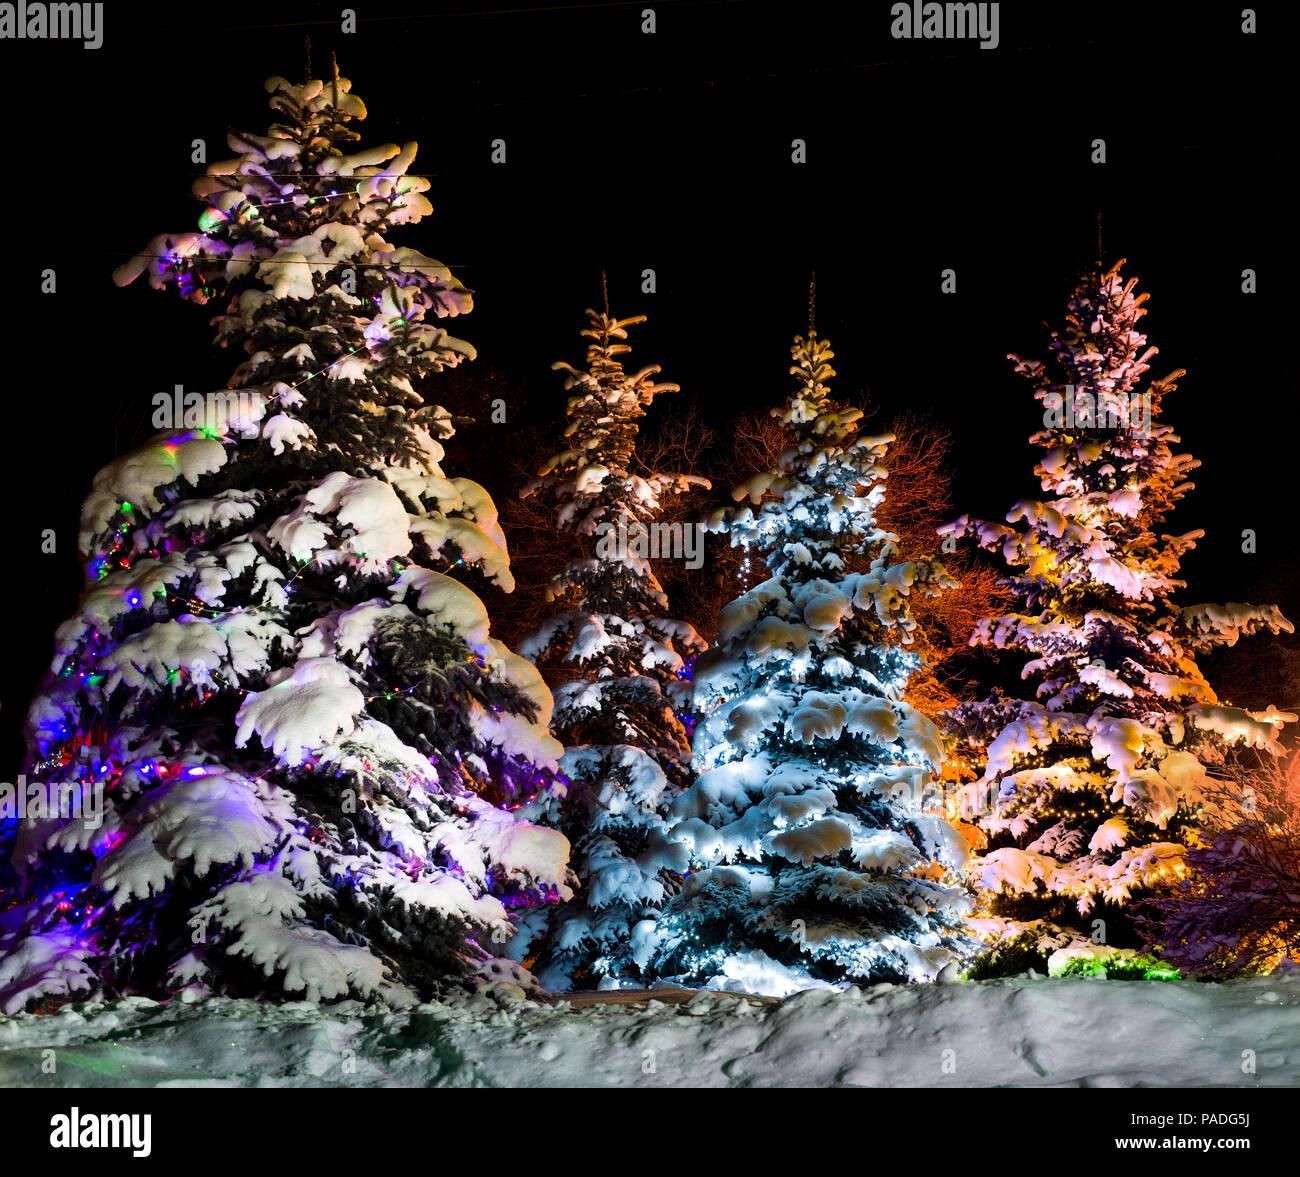 Beau Noël firtree resplendissante avec guirlande multicolore onn- nuit étoilée background Photo Stock